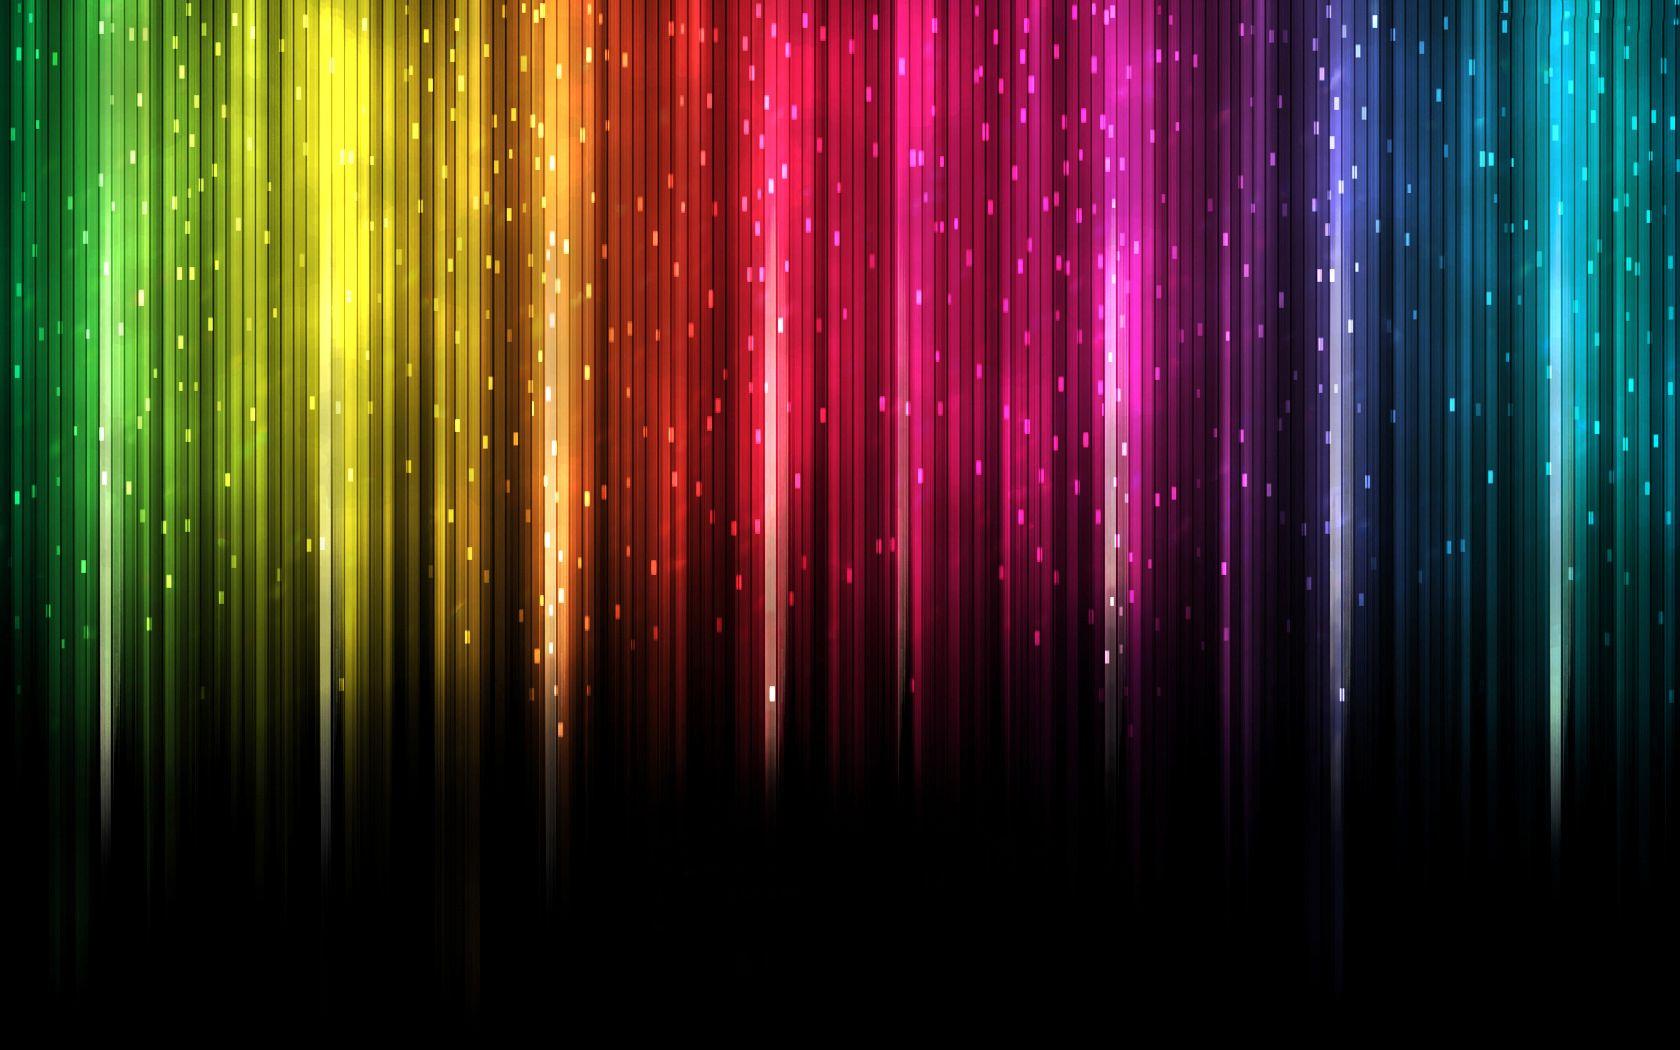 Rainbow Wallpaper 4463 1680x1050 px HDWallSource Accent Walls 1680x1050